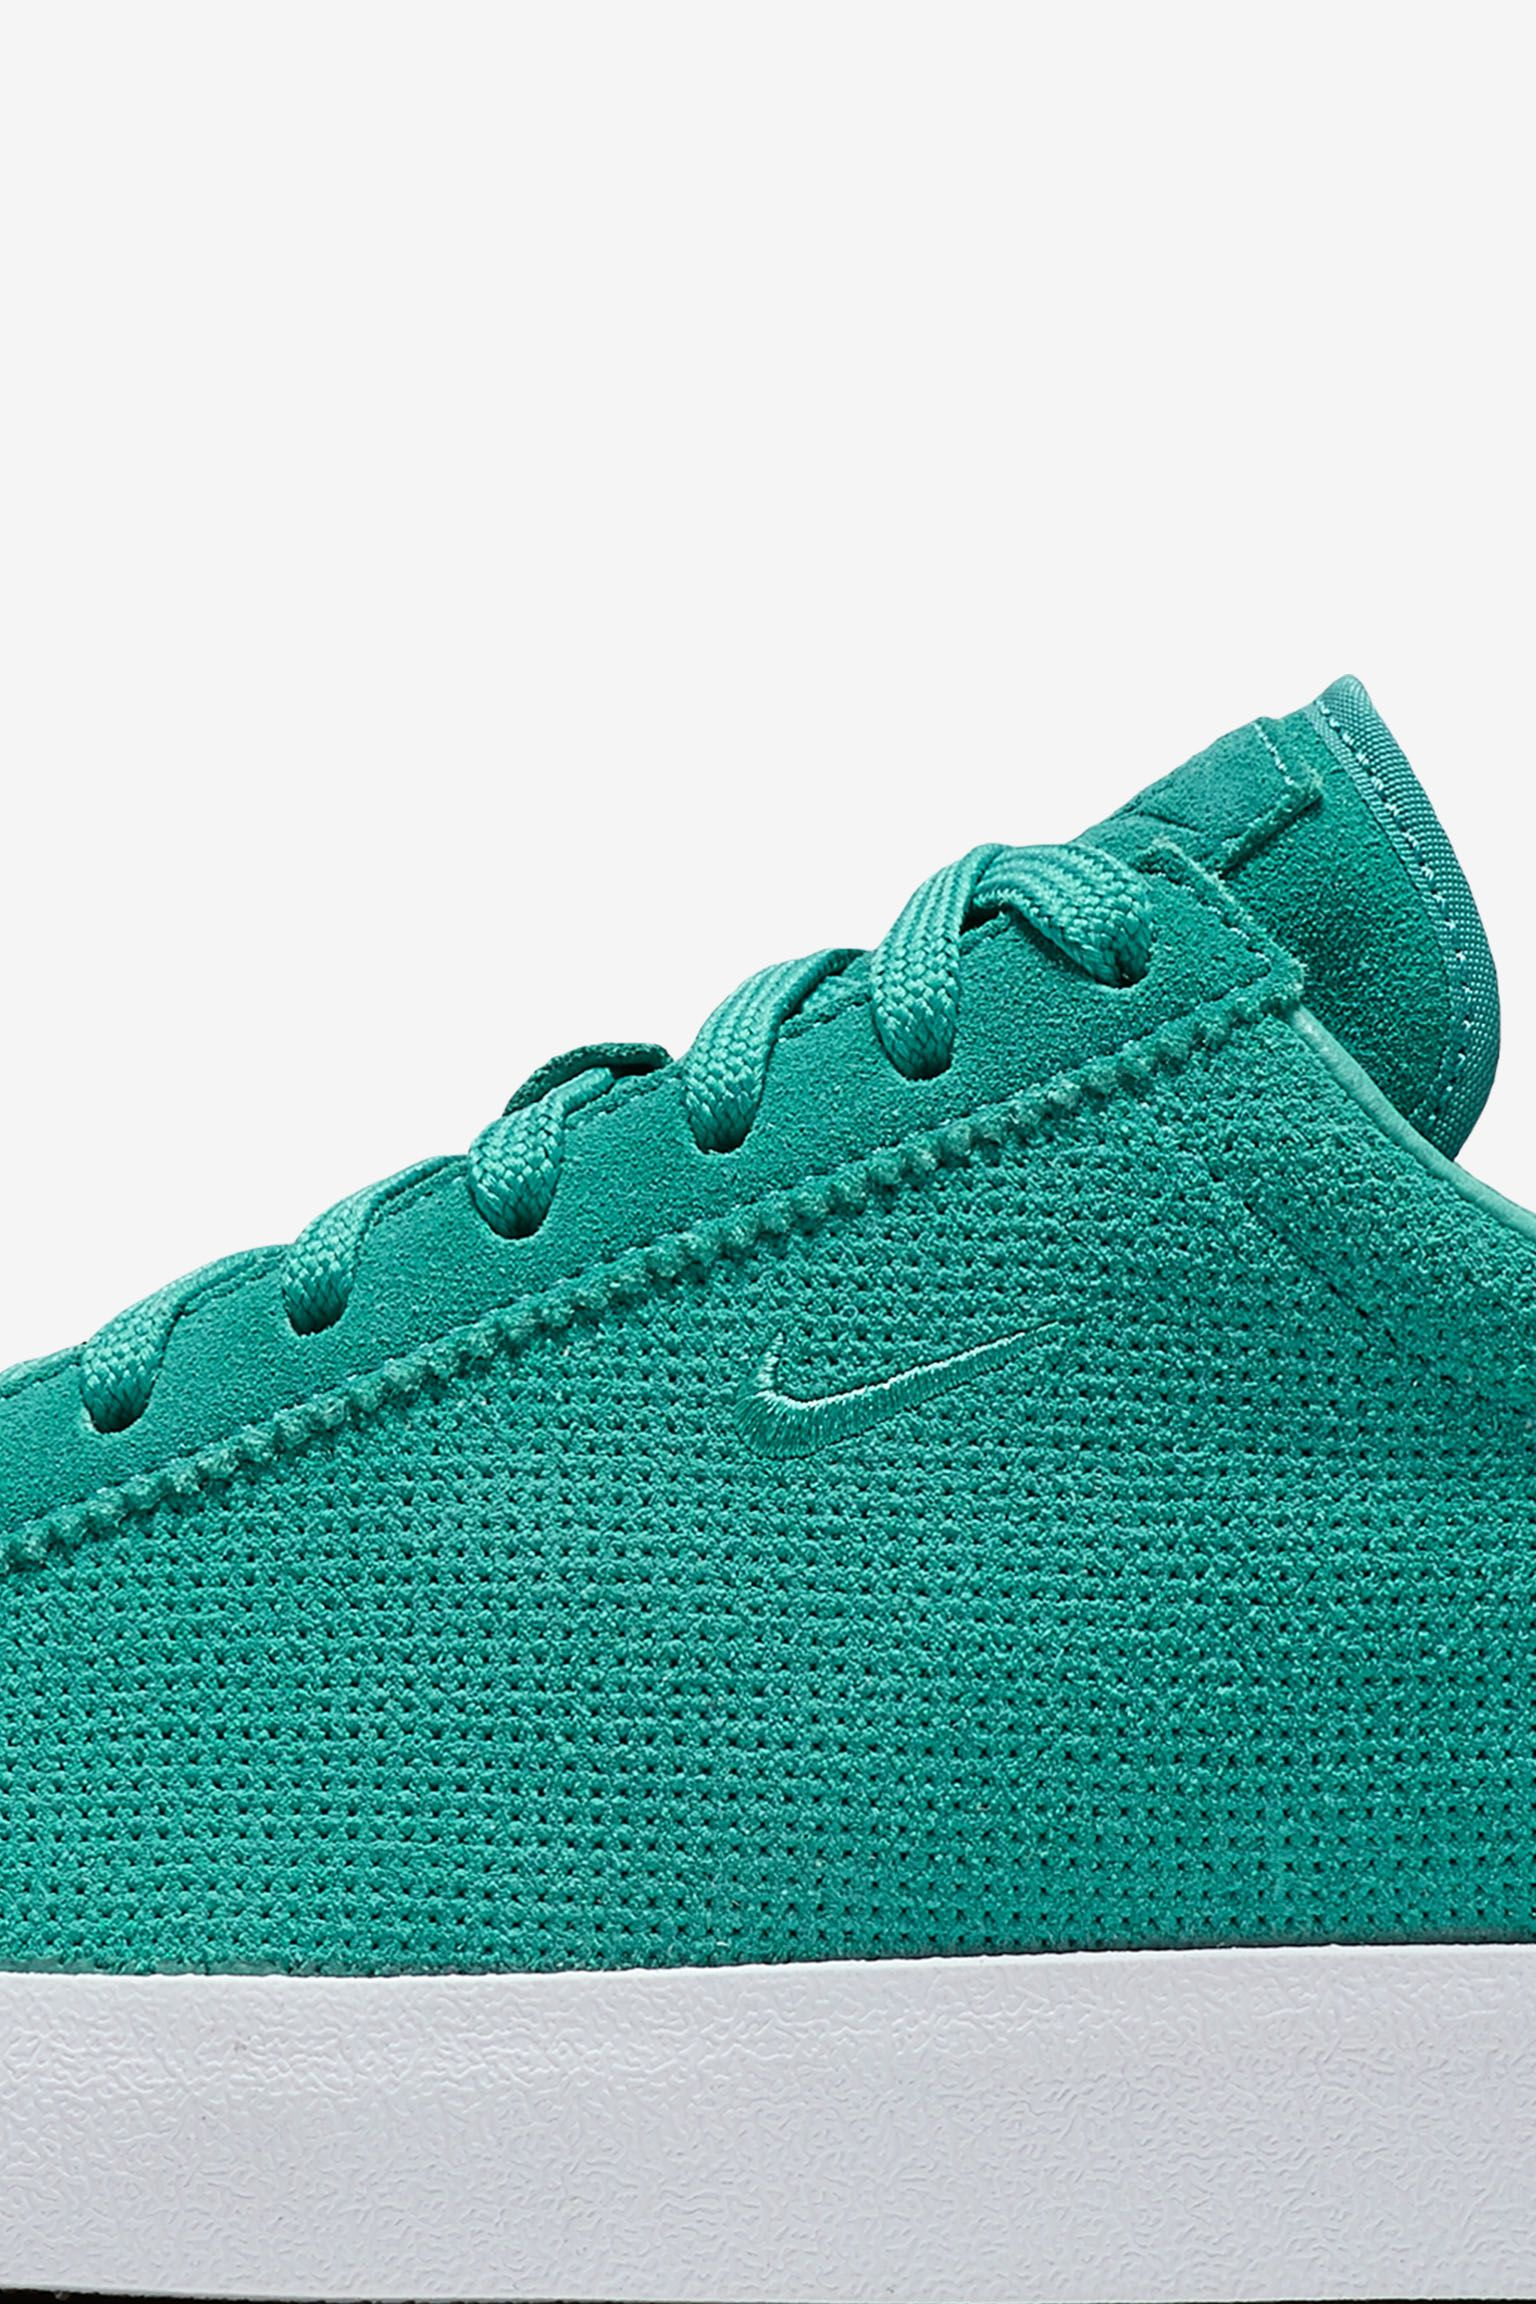 NikeCourt Match Classic 'Clear Jade'